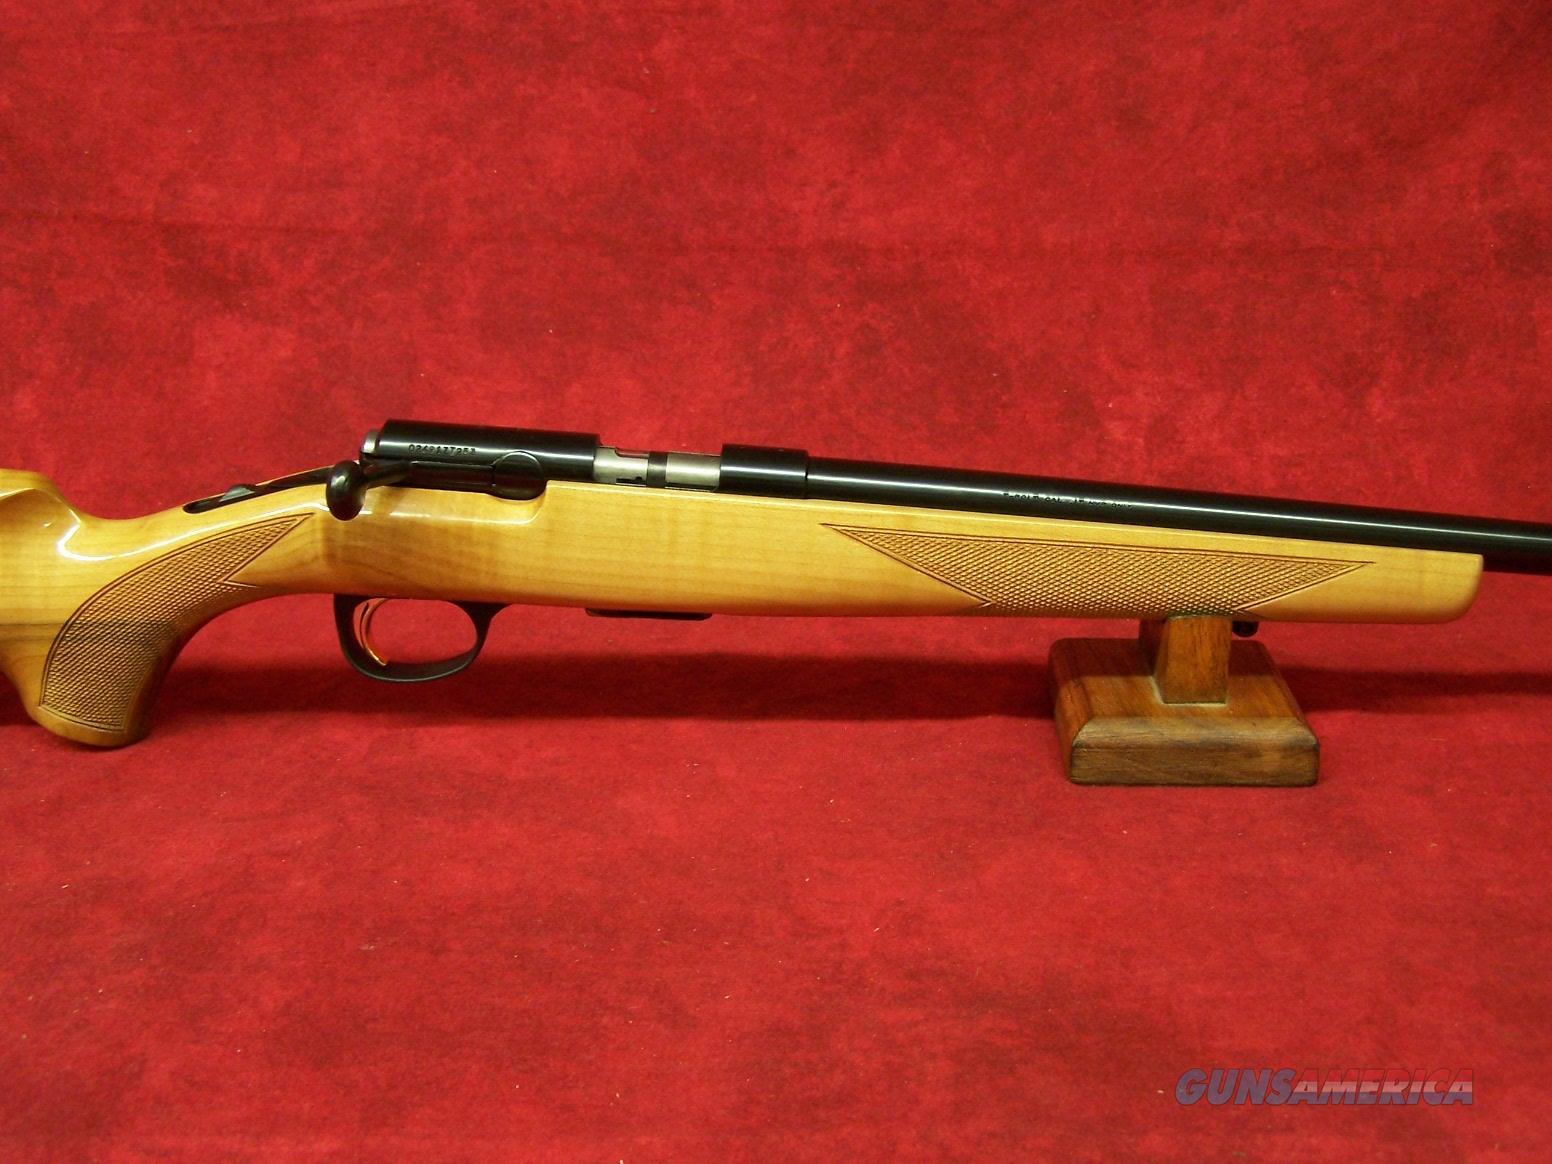 "Browning T-Bolt Sporter Maple .17 HMR 22"" barrel (025216270)  Guns > Rifles > Browning Rifles > Bolt Action > Hunting > Blue"